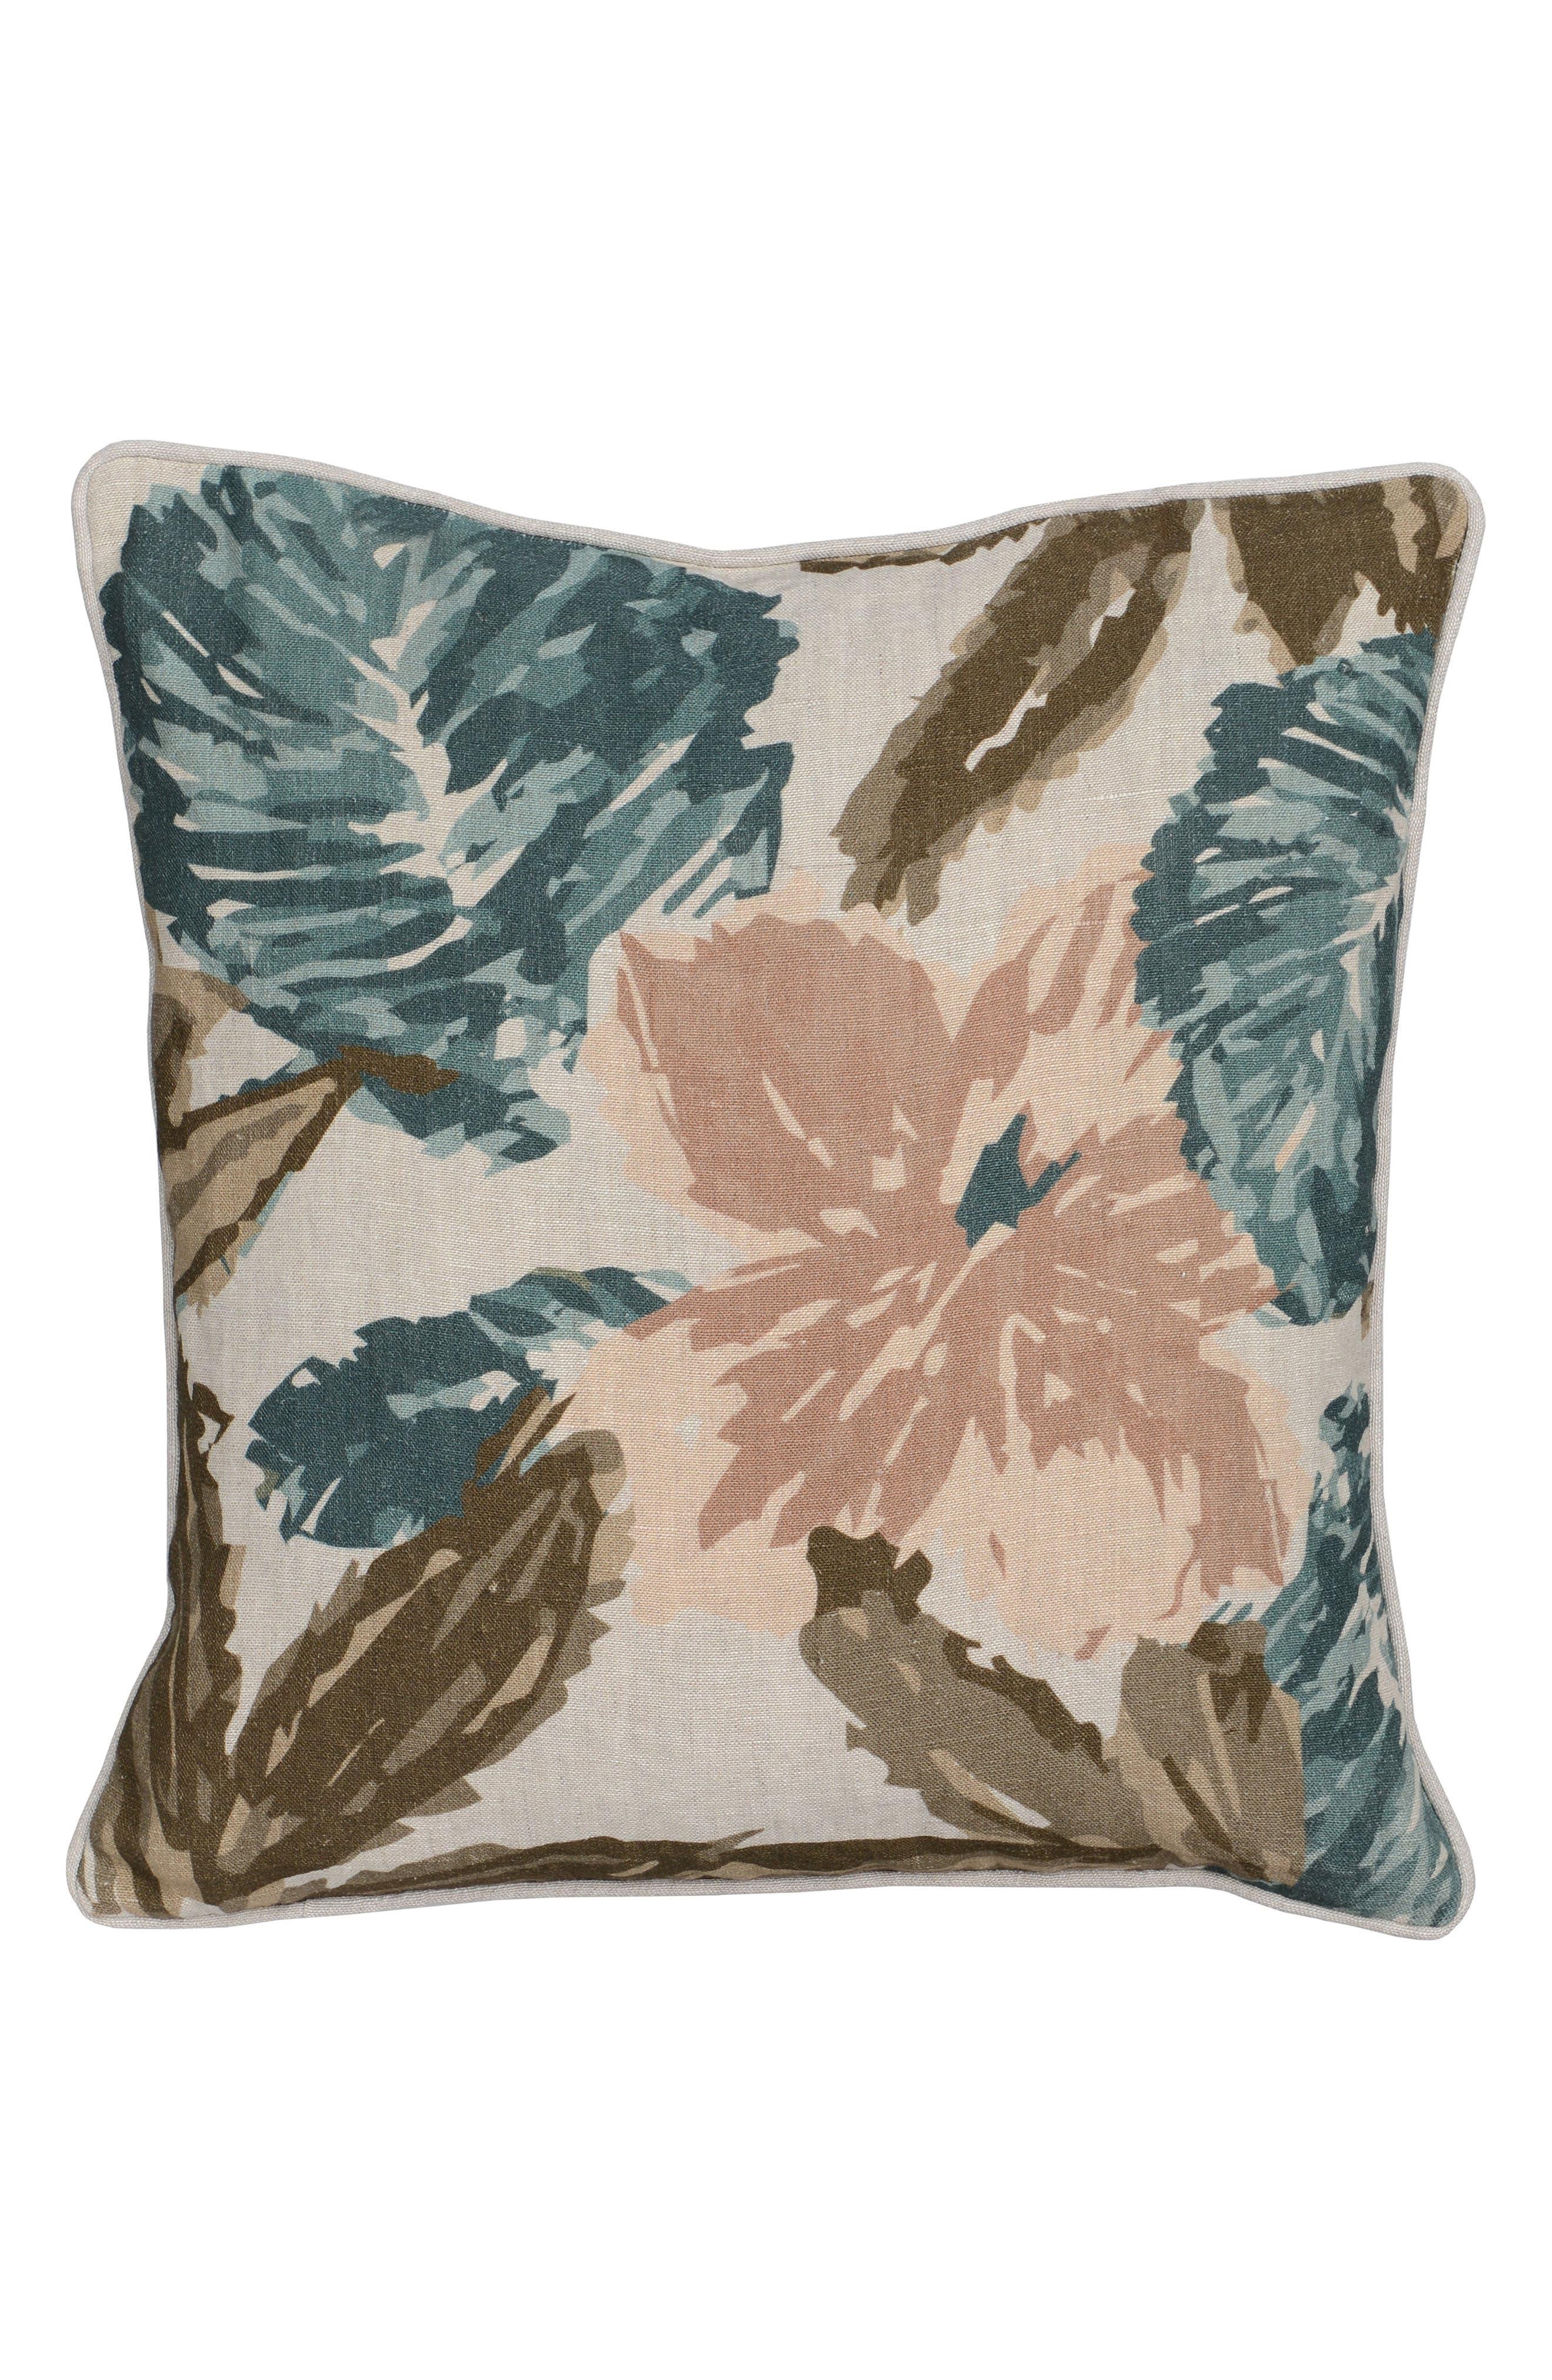 Callie Pillow,                         Main,                         color, Beige/ Teal/ Blush